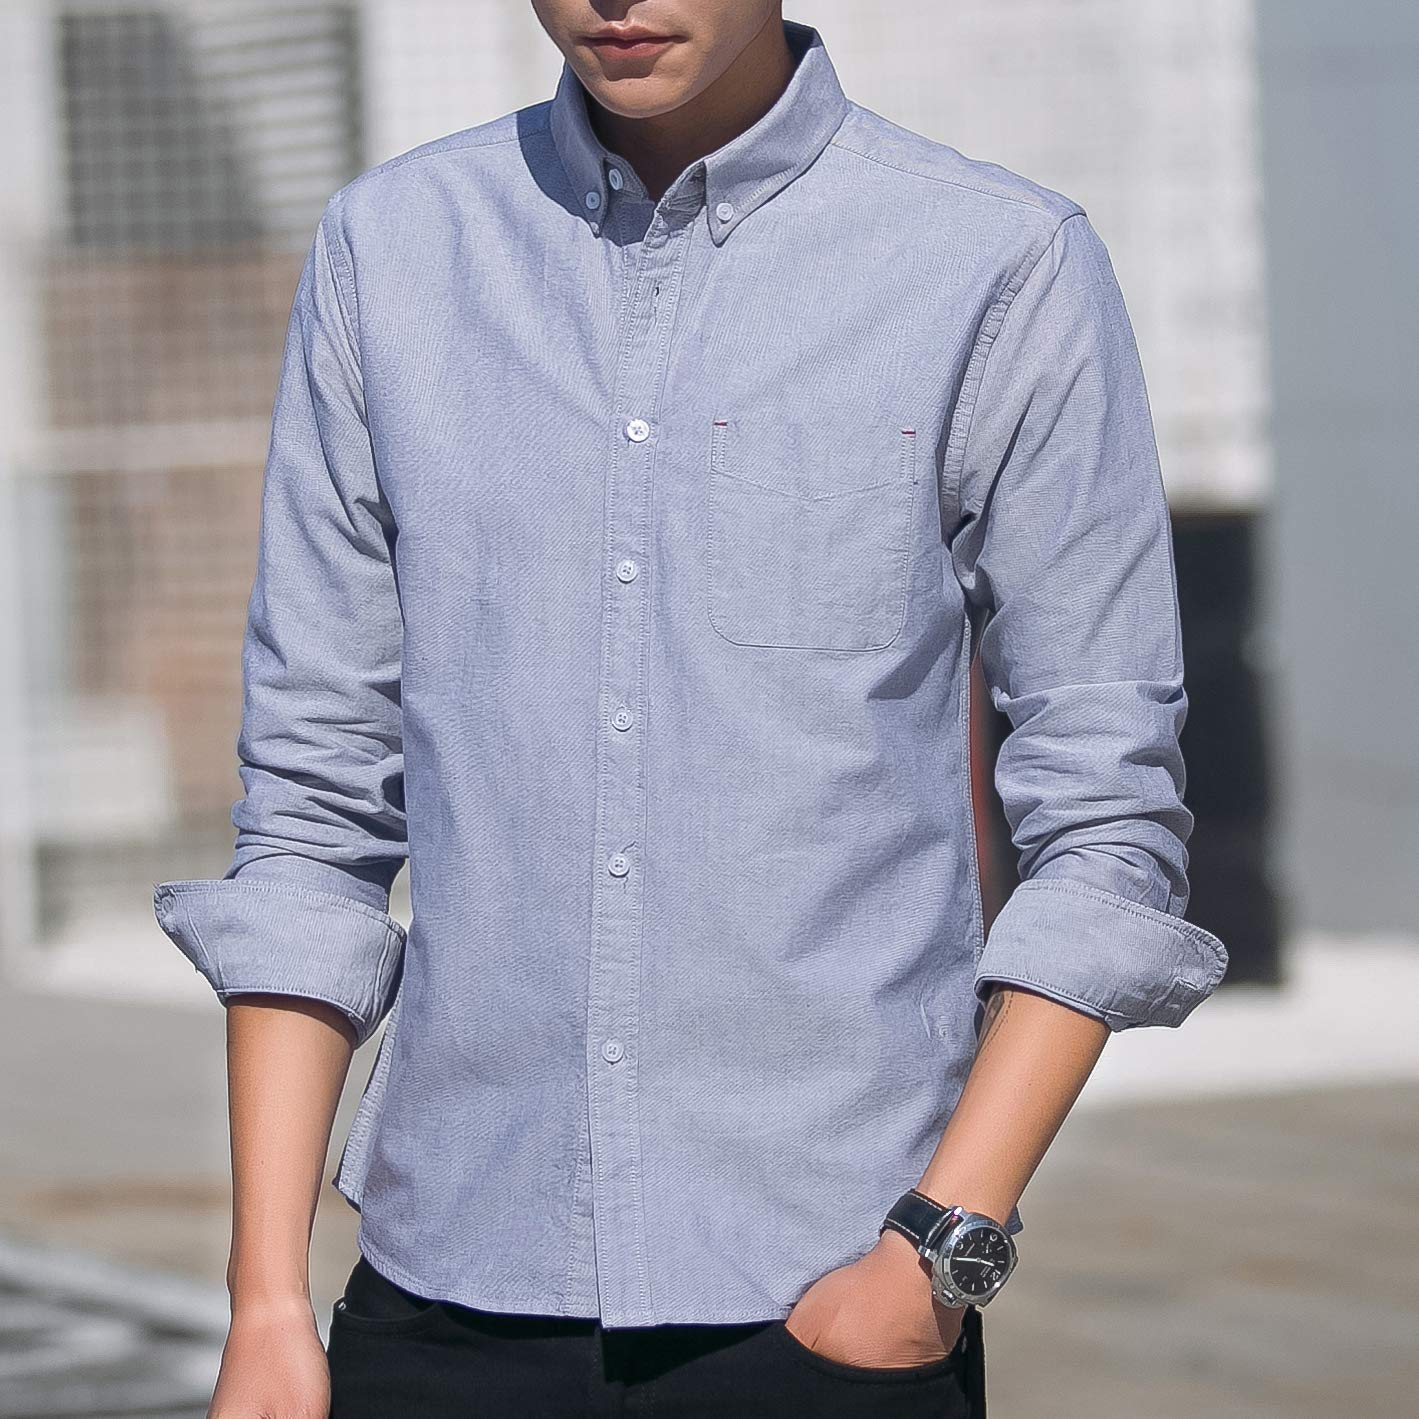 Womleys Mens Casual Long Sleeve Regular Fit Oxford Shirt Button Down Dress Shirts